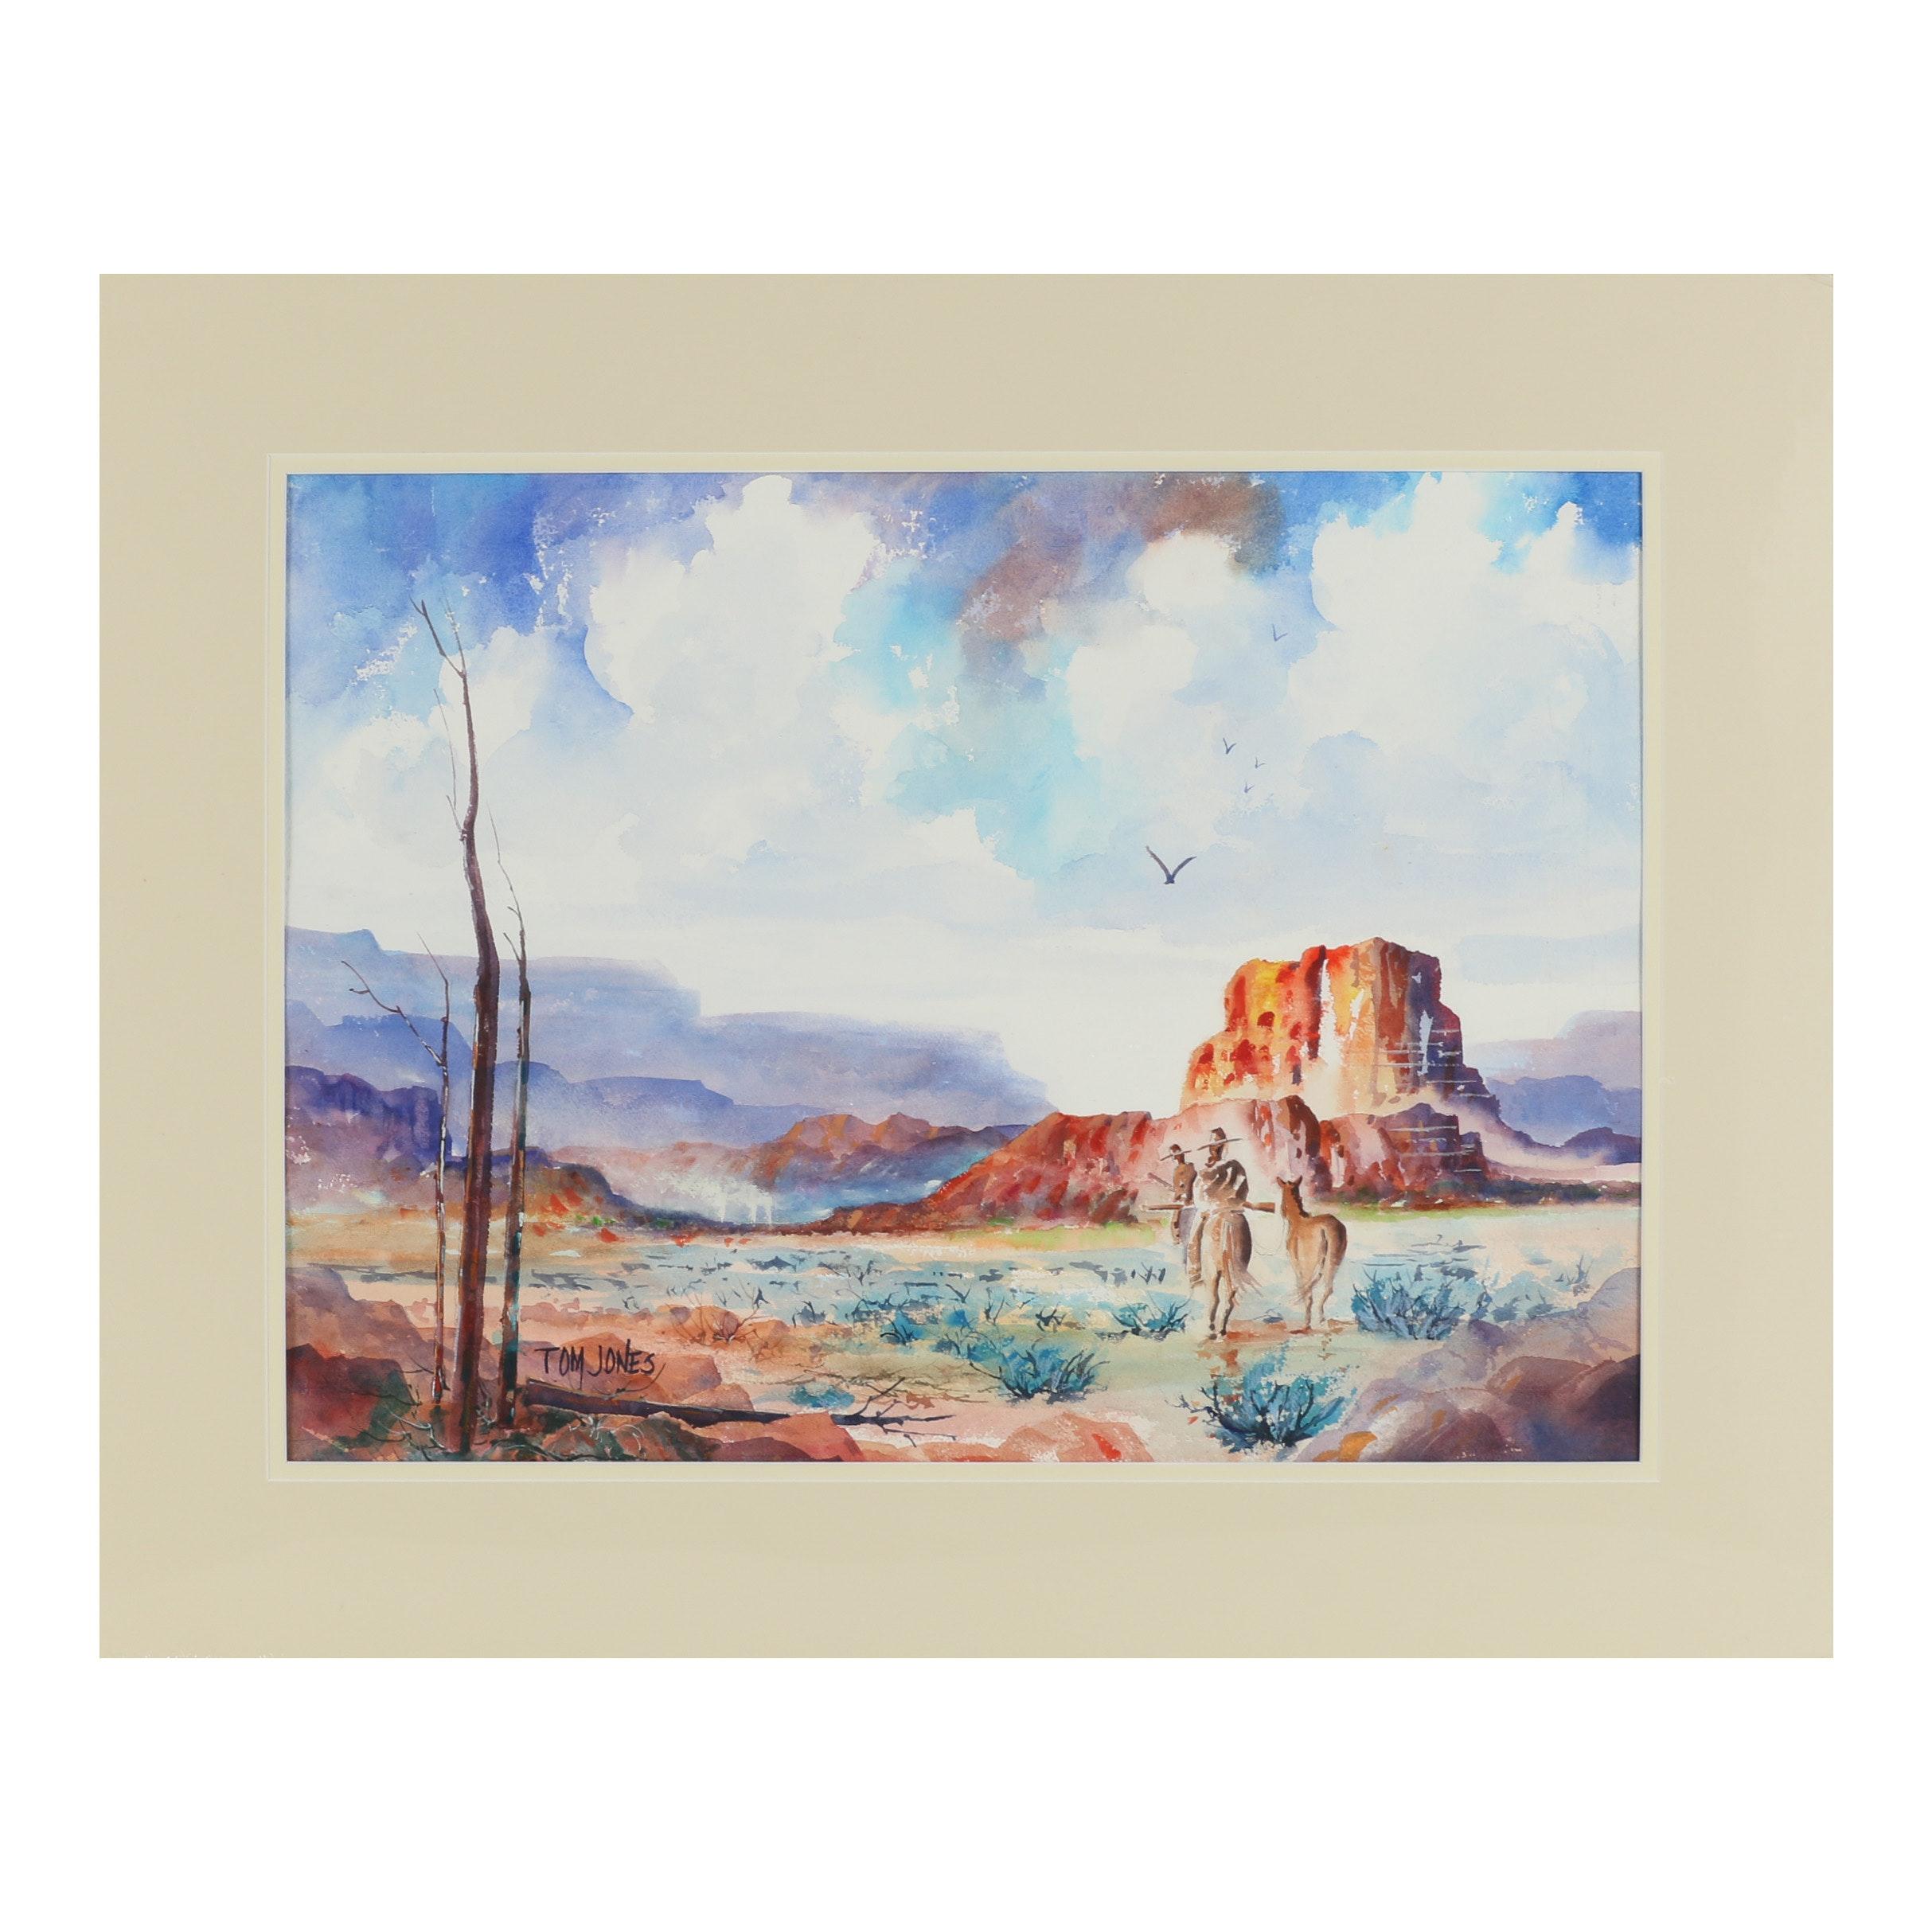 Tom Jones Watercolor Painting